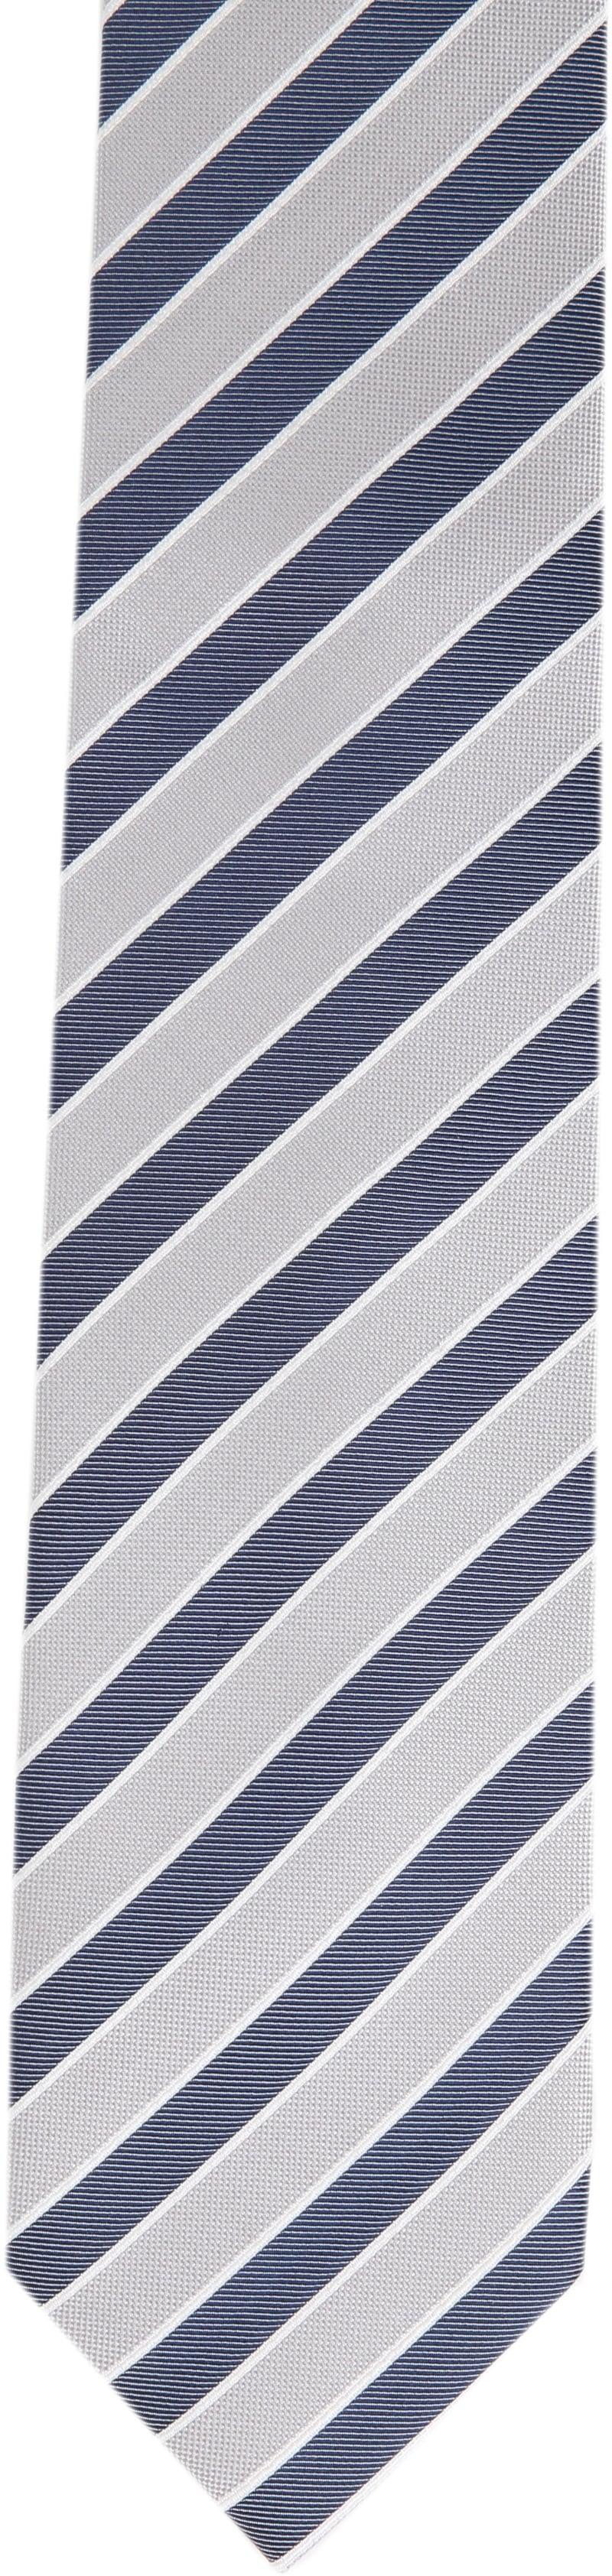 Krawatte Seide Dunkelblau Grau Streifen Foto 2